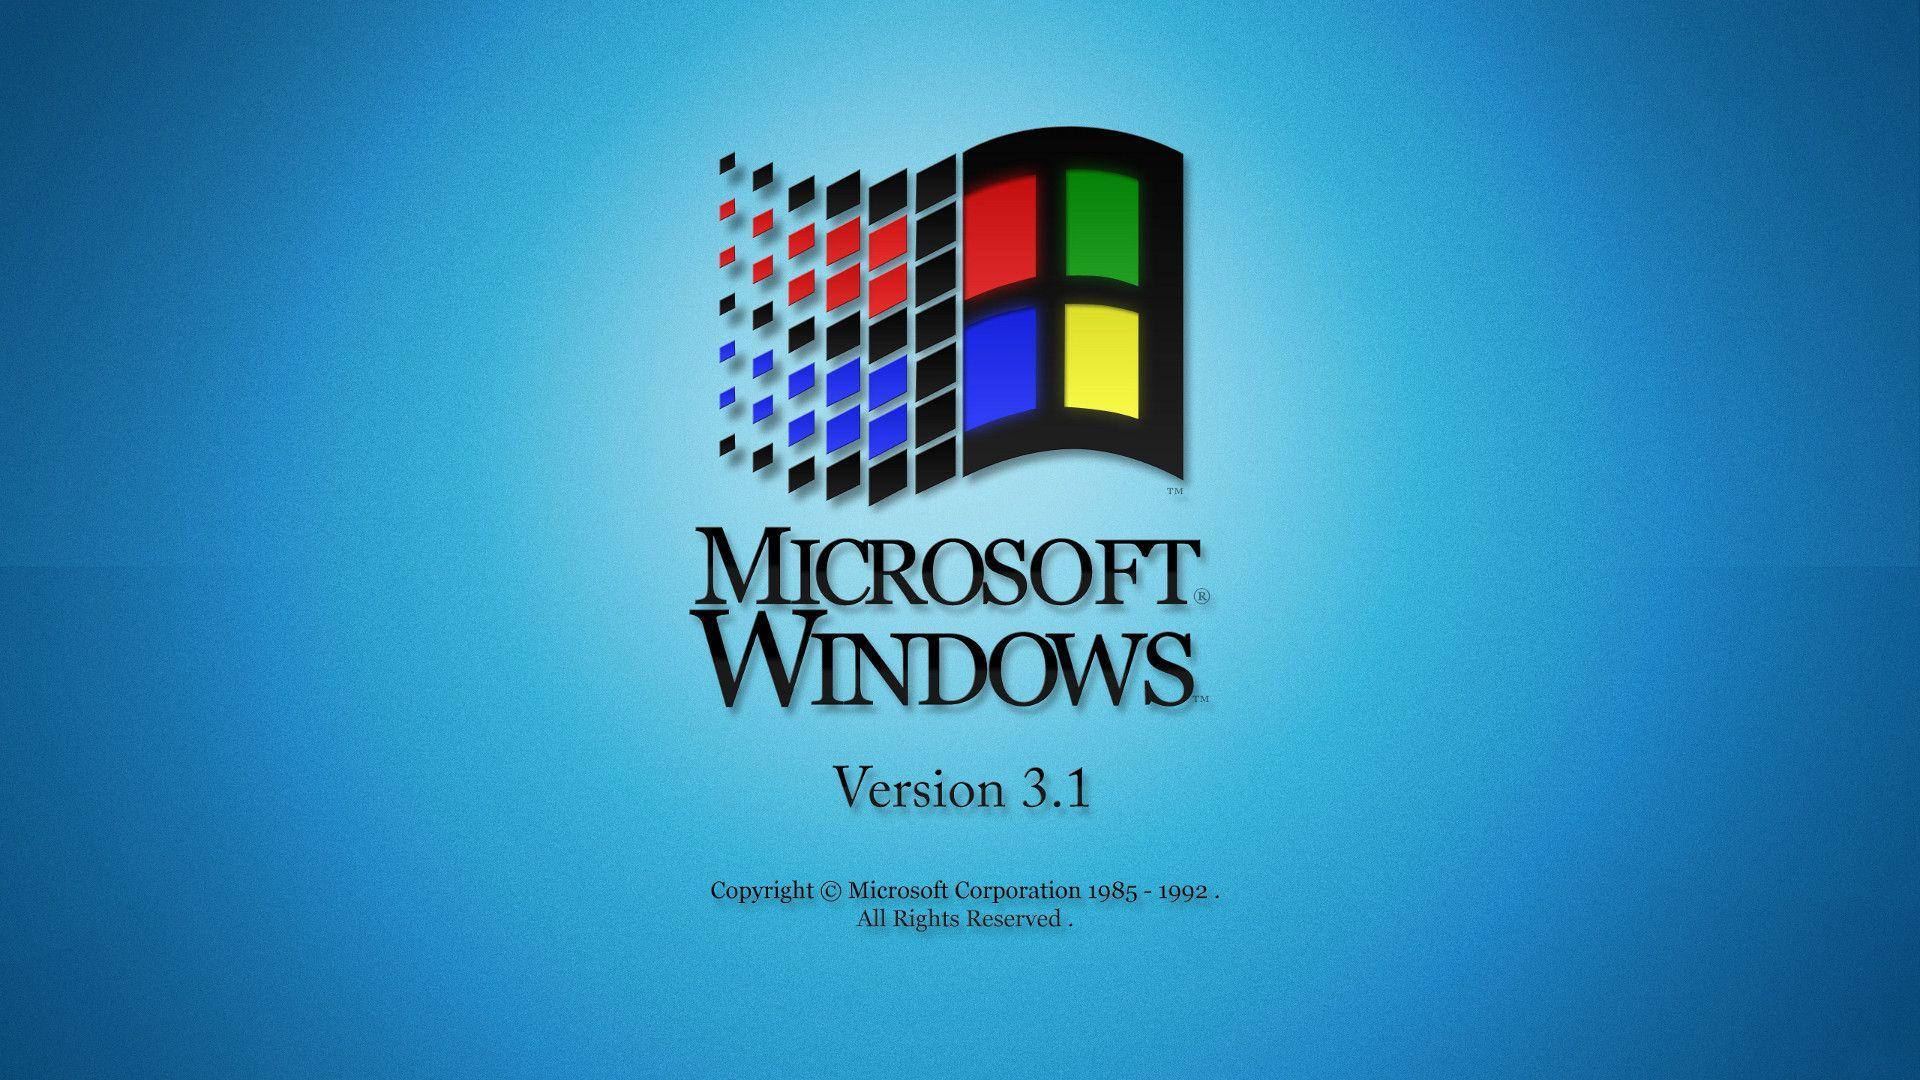 Unduh 200 Wallpaper Android Windows 98  Paling Baru